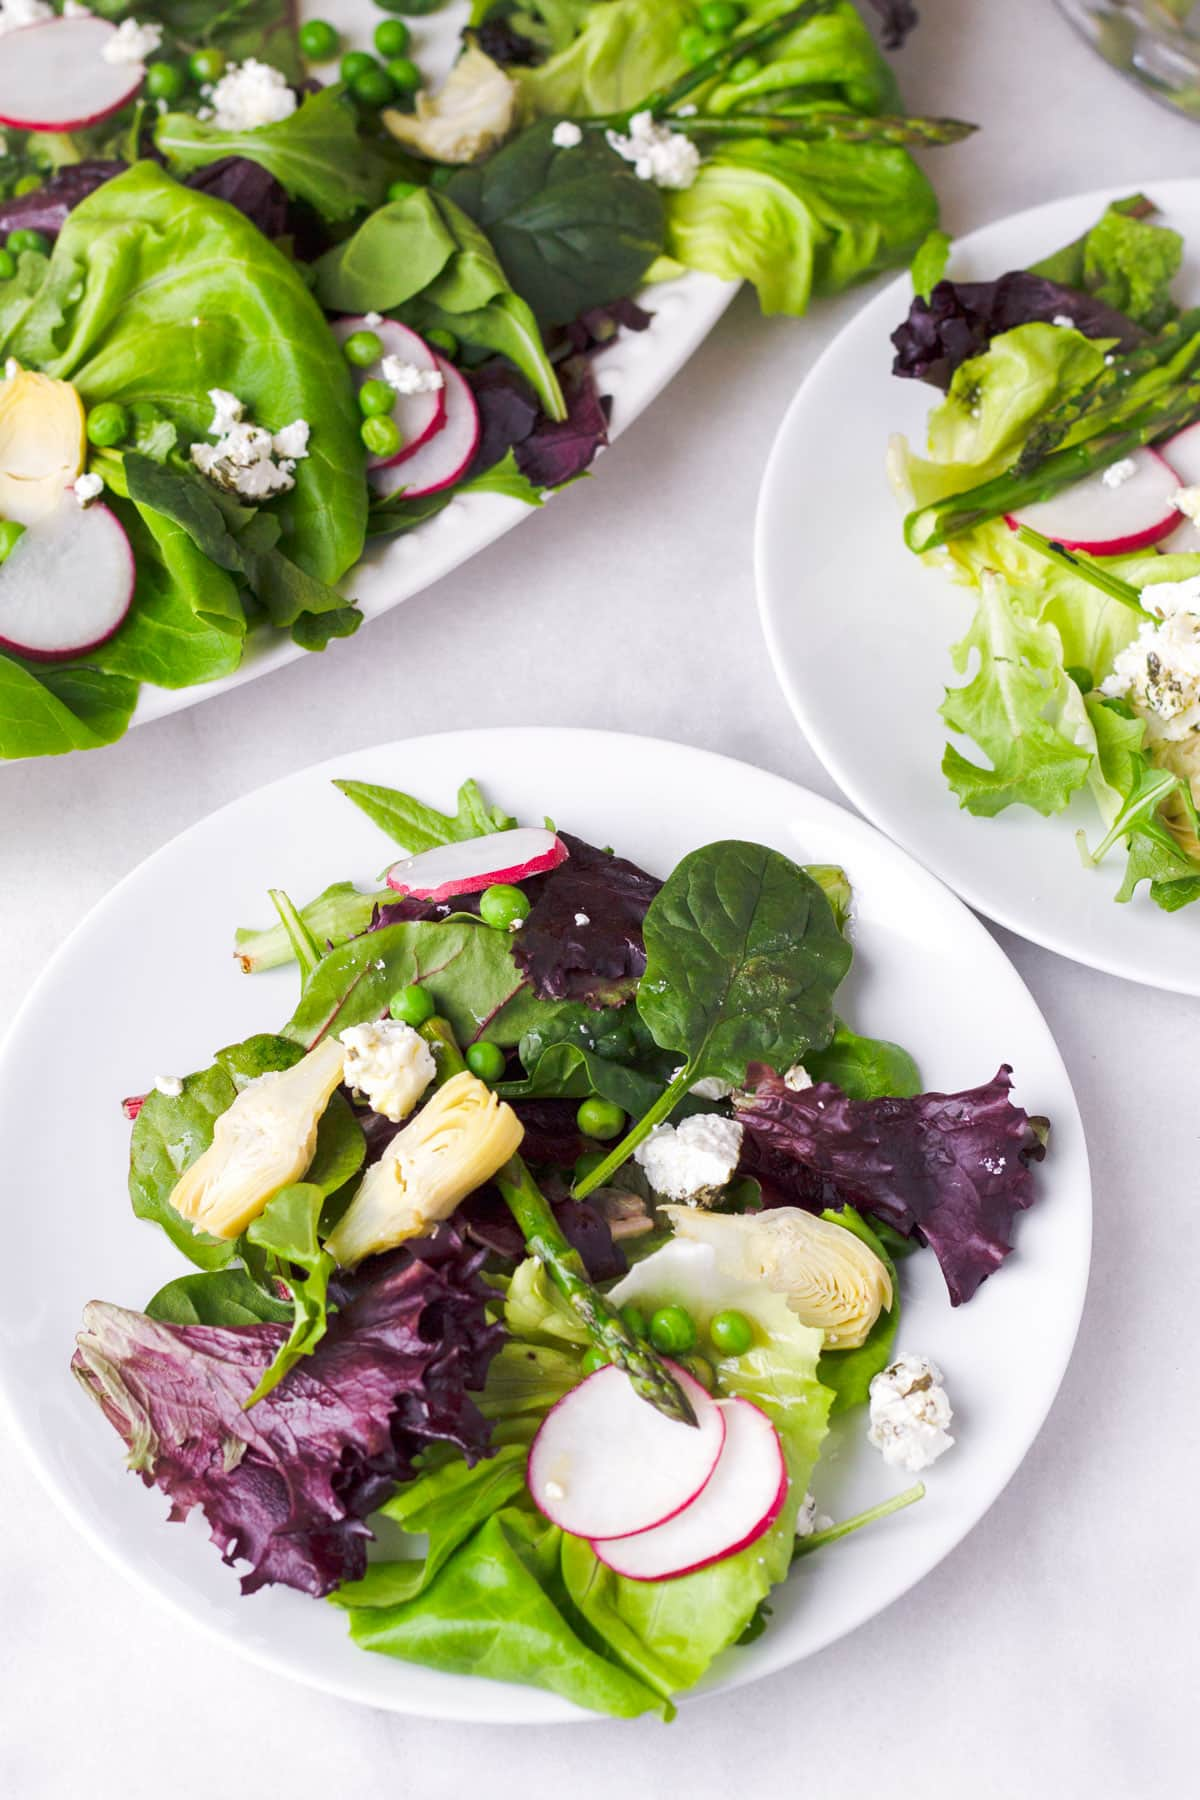 Two individual portions of mixed green salad next to a bigger platter of salad